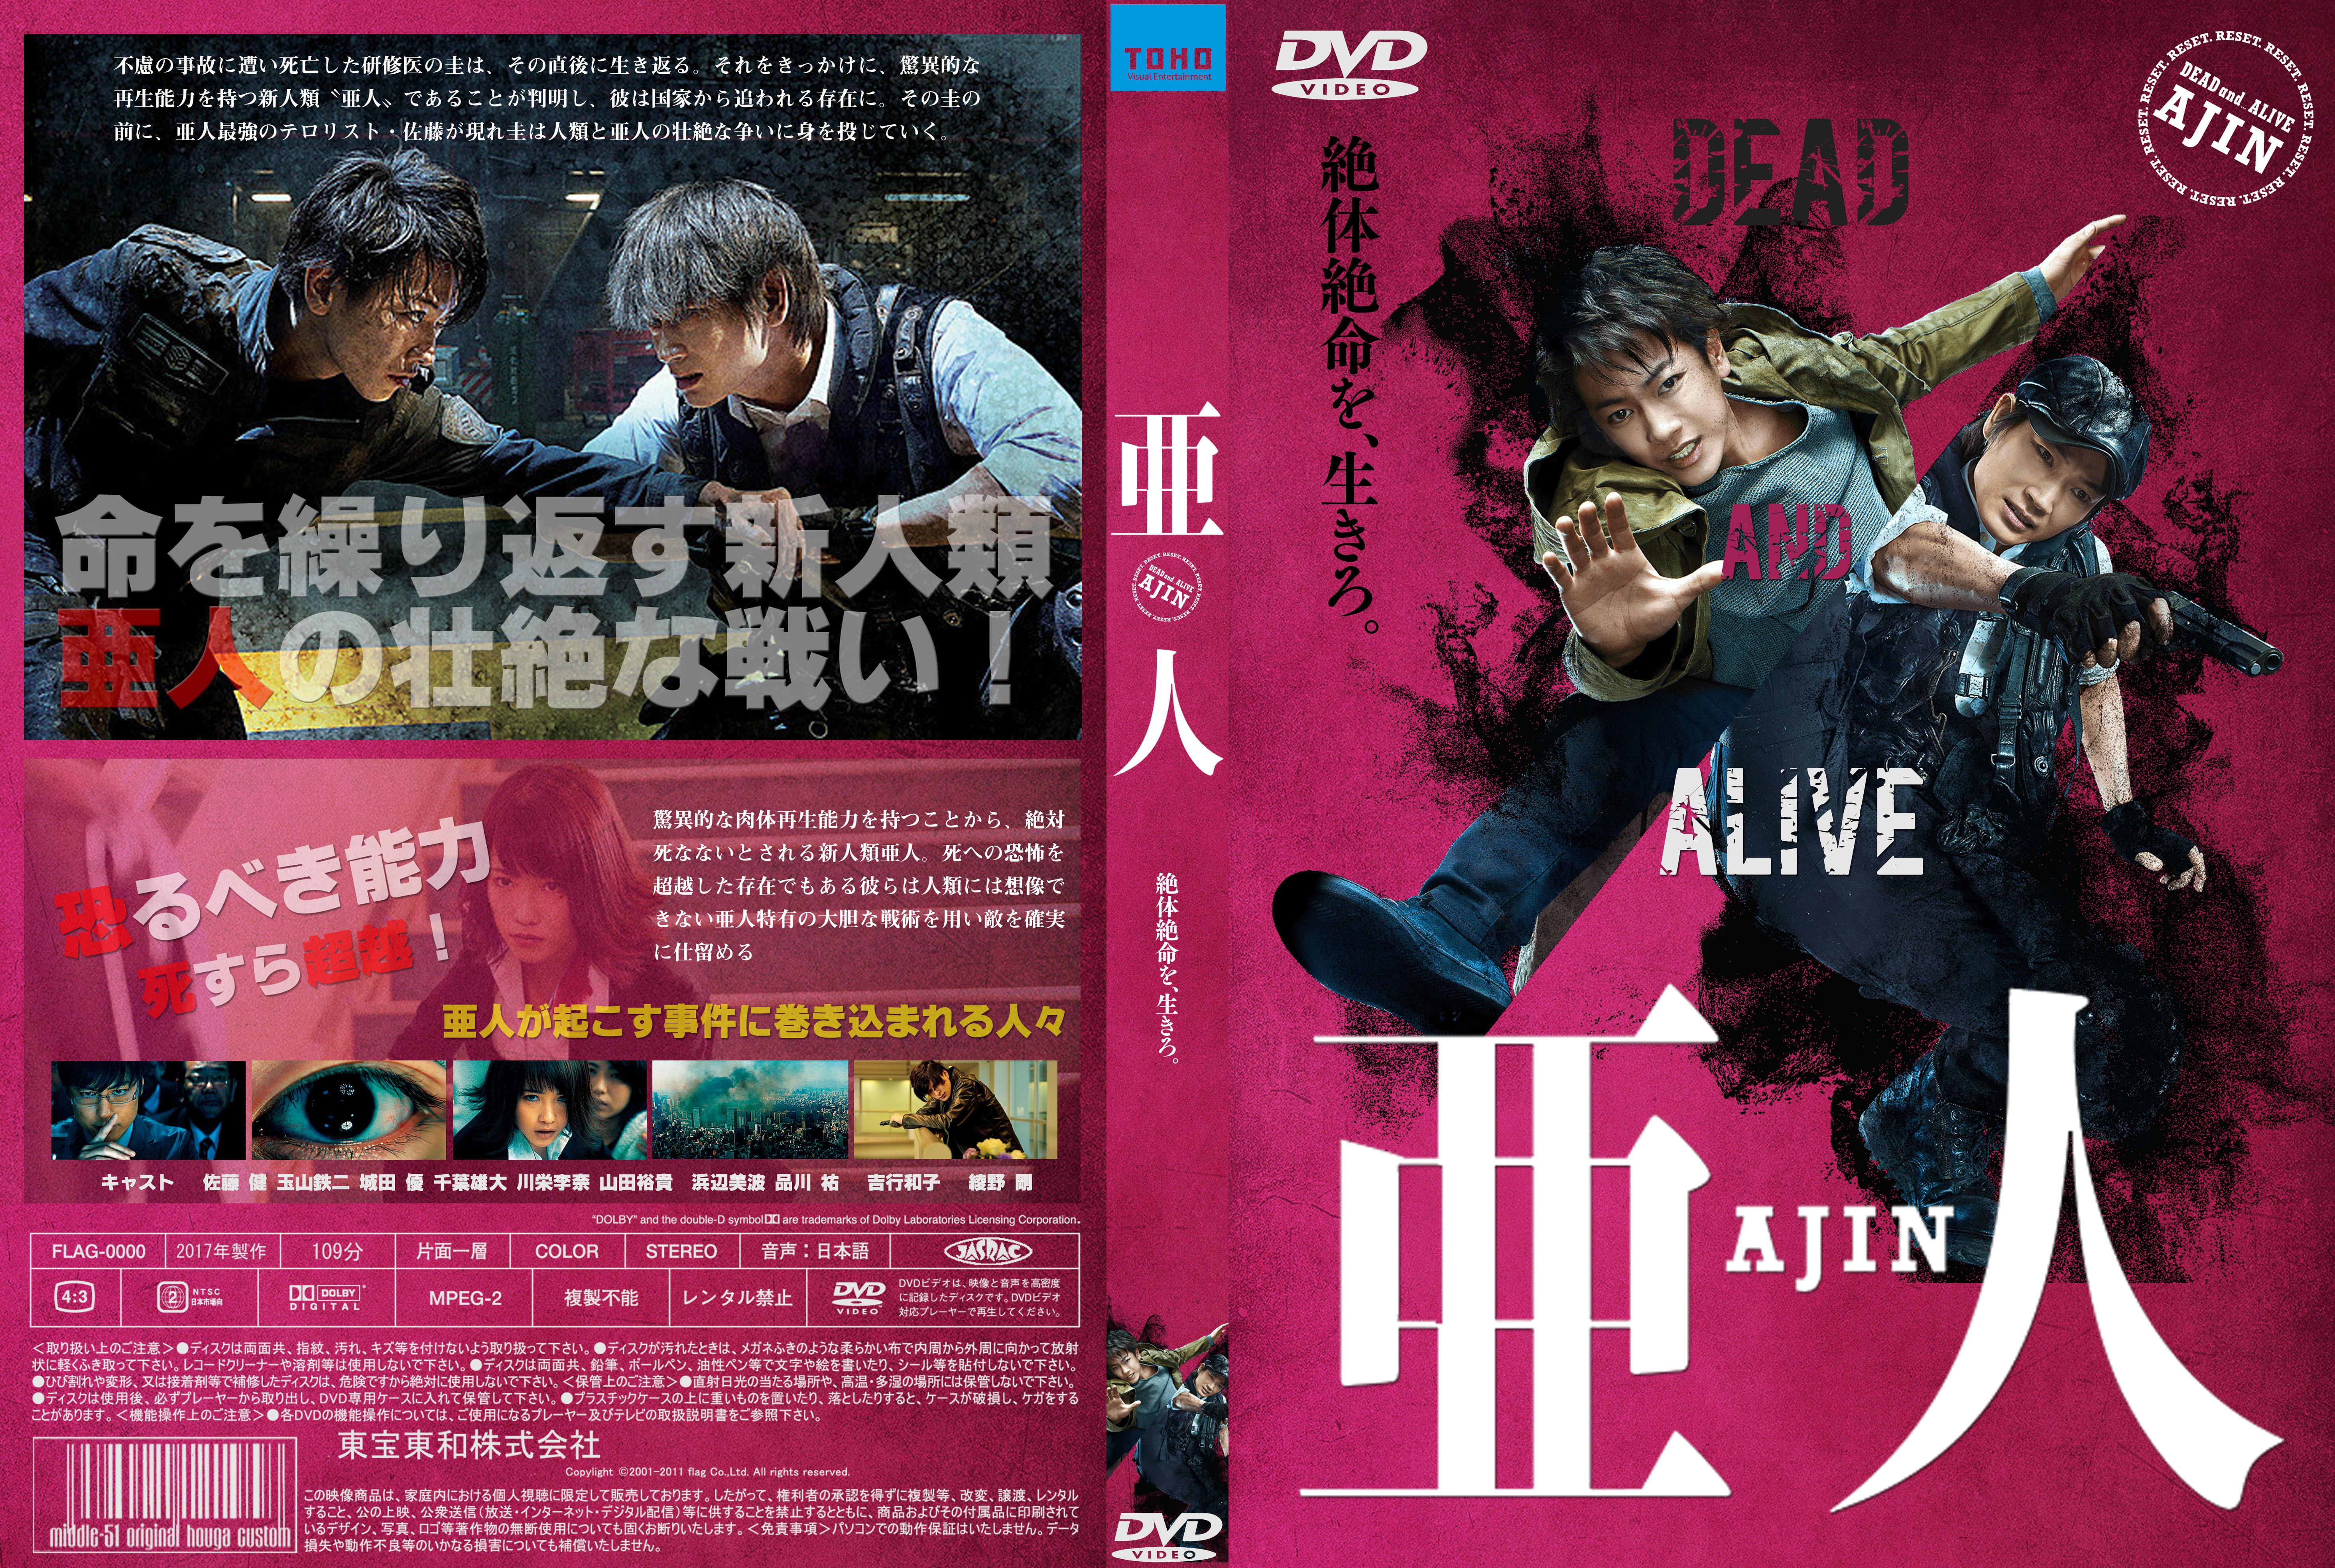 DVD 14mmジャケット